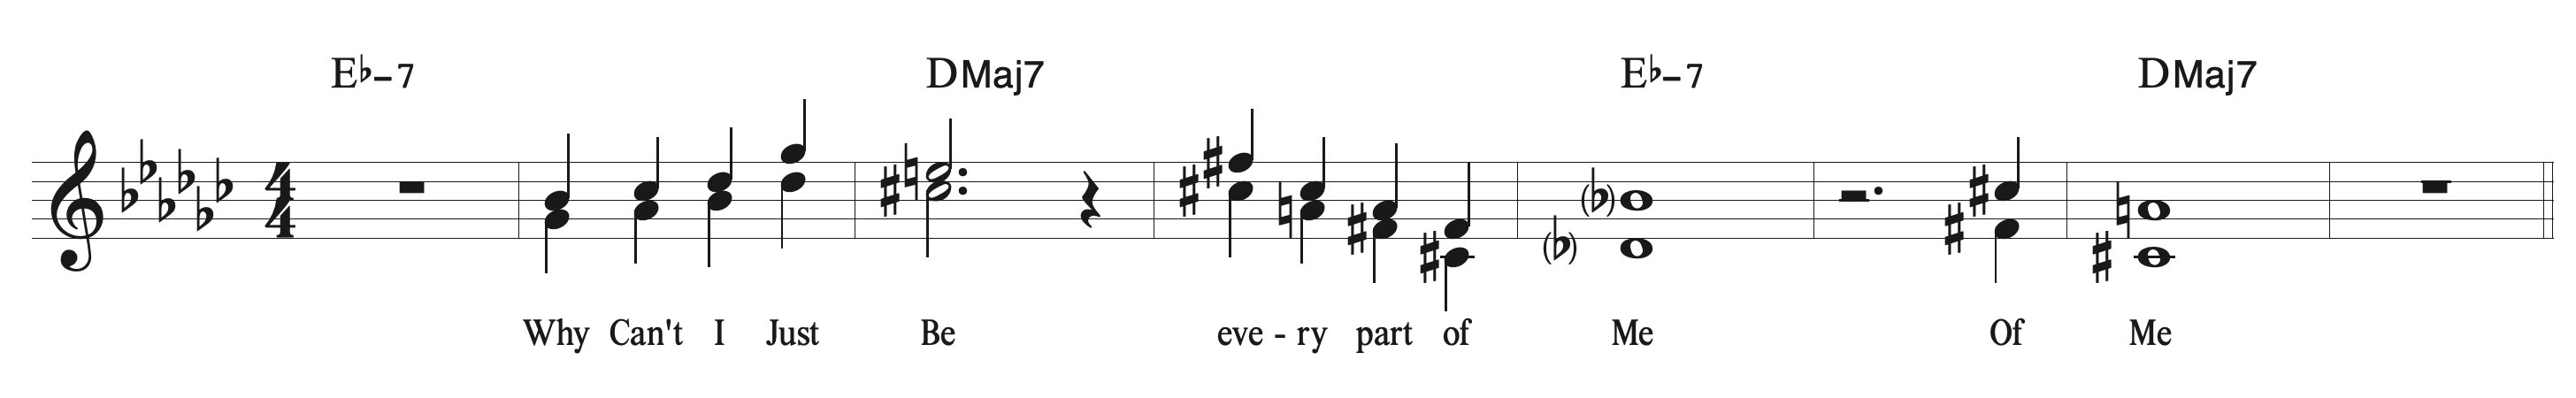 Every Part Of Me: Chorus